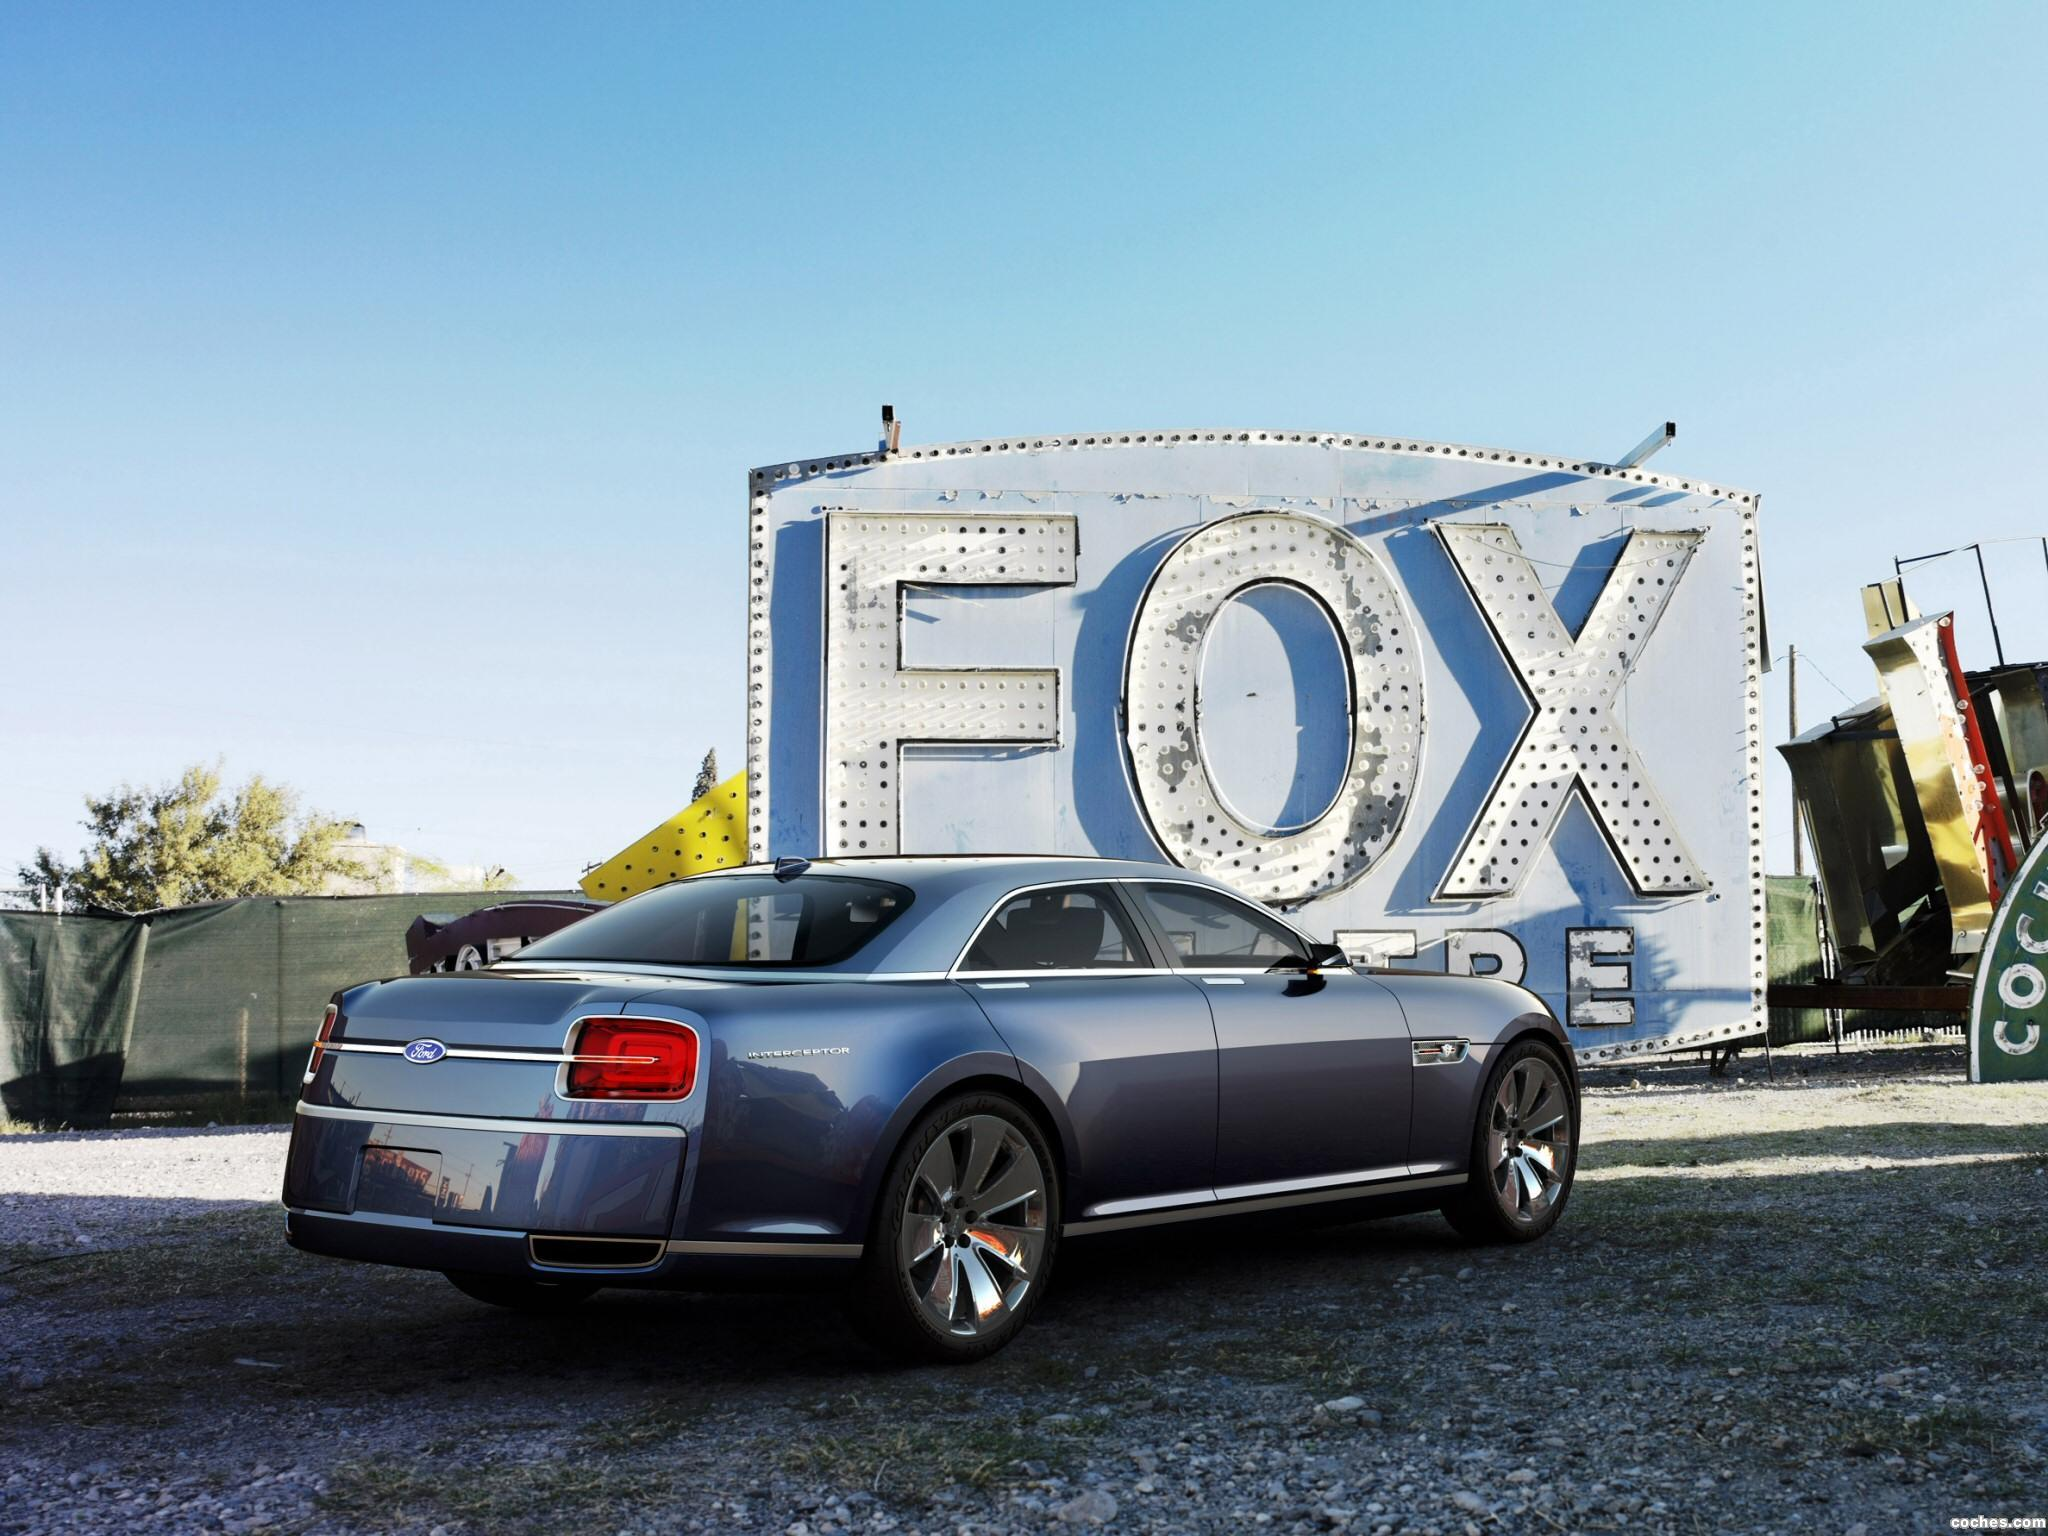 Foto 2 de Ford Interceptor Concept 2007